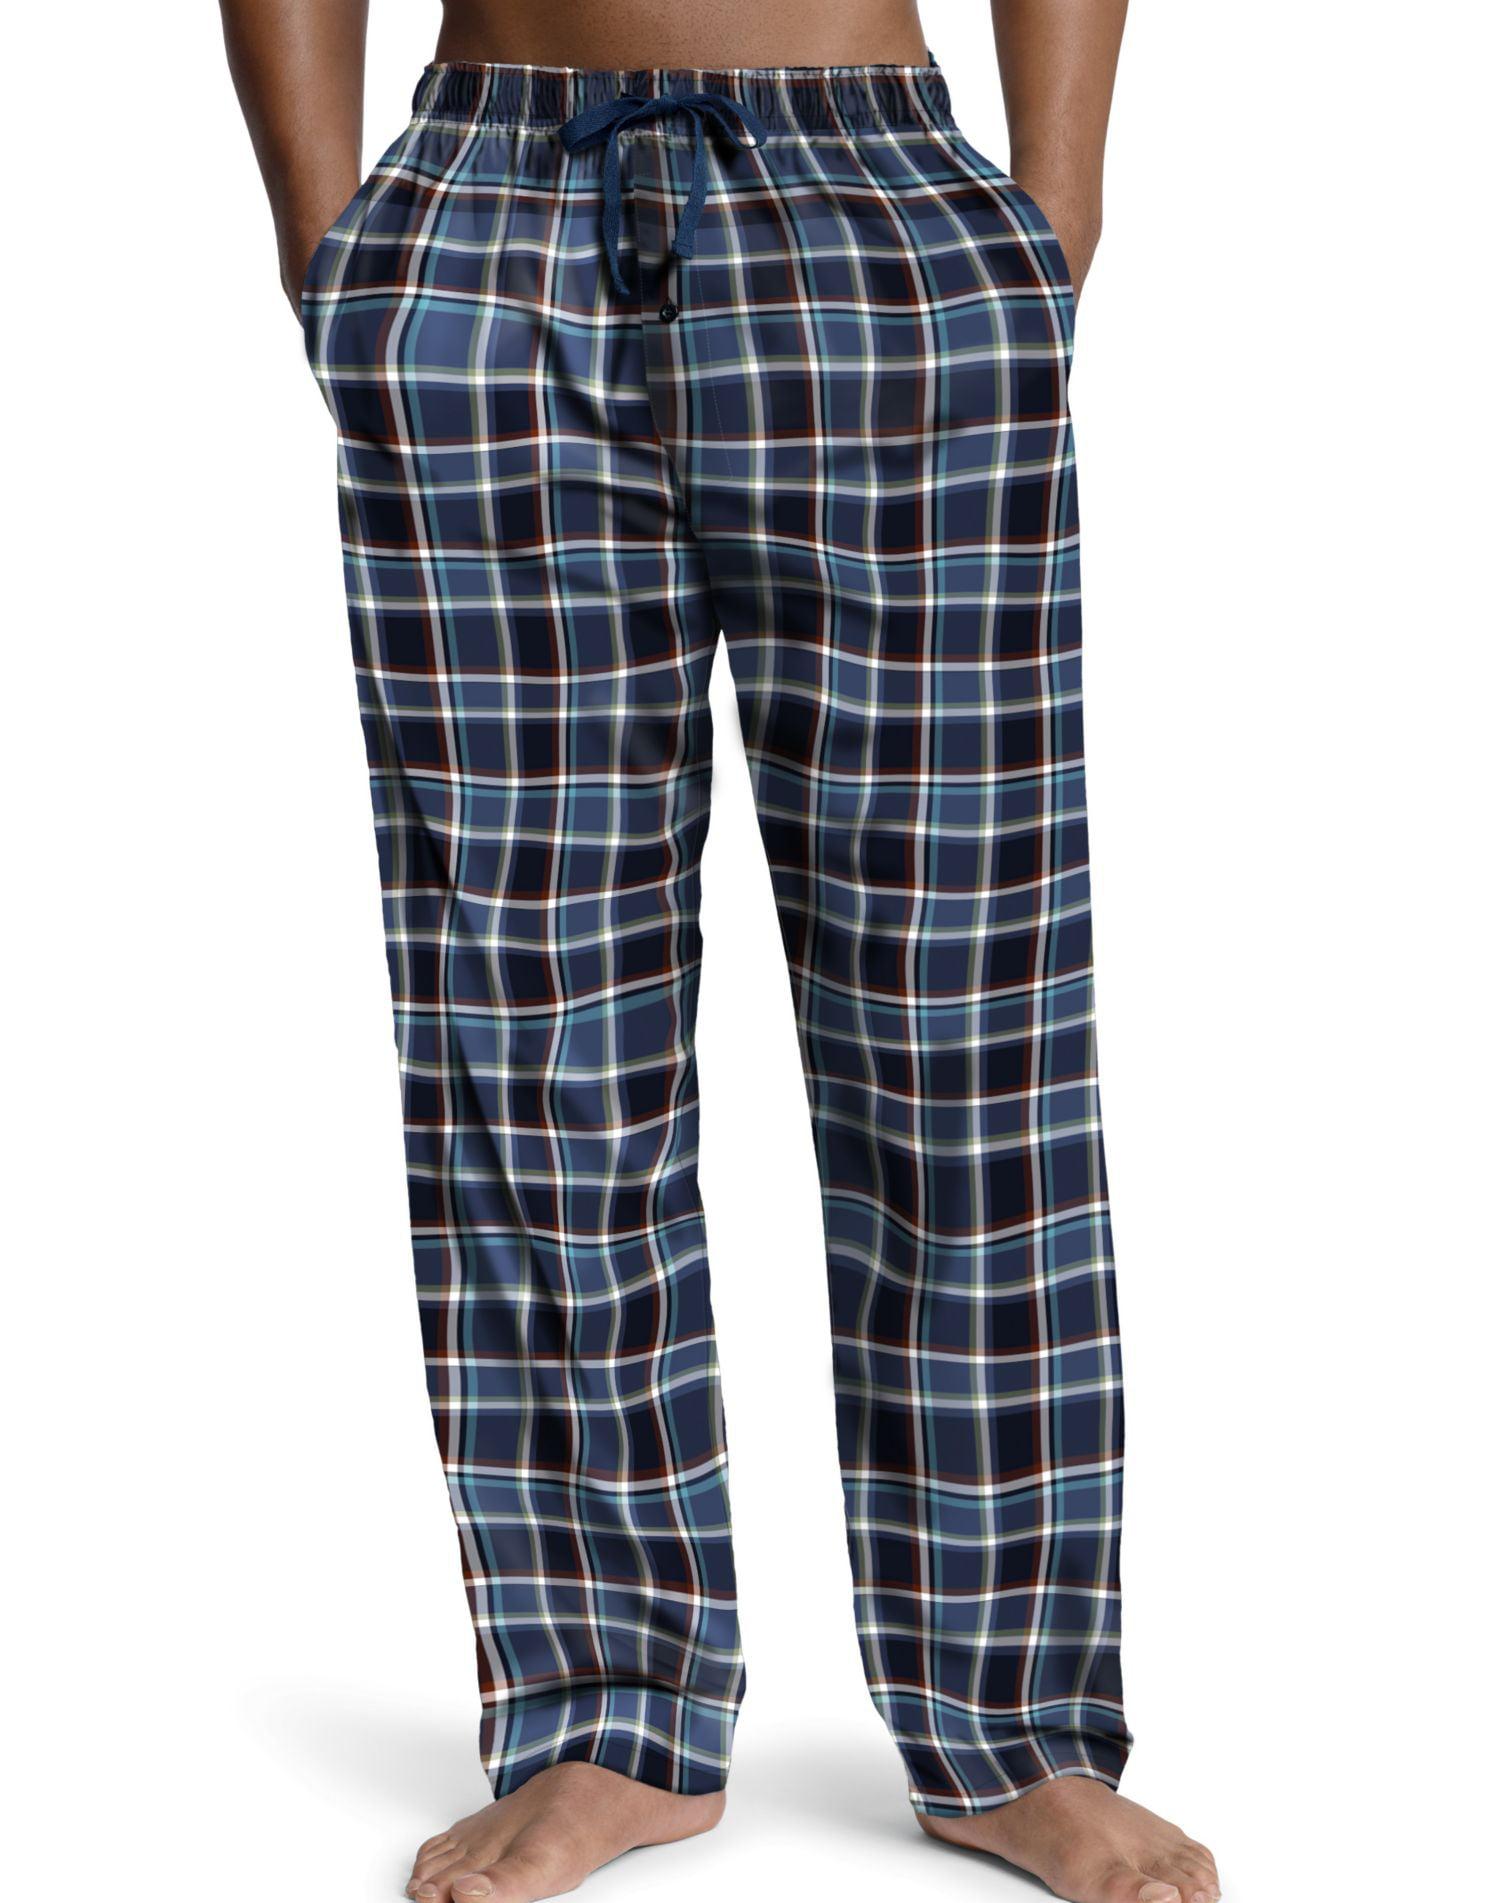 Hane Tagless Pajamas Knit T Top /& Woven Plaid Pants